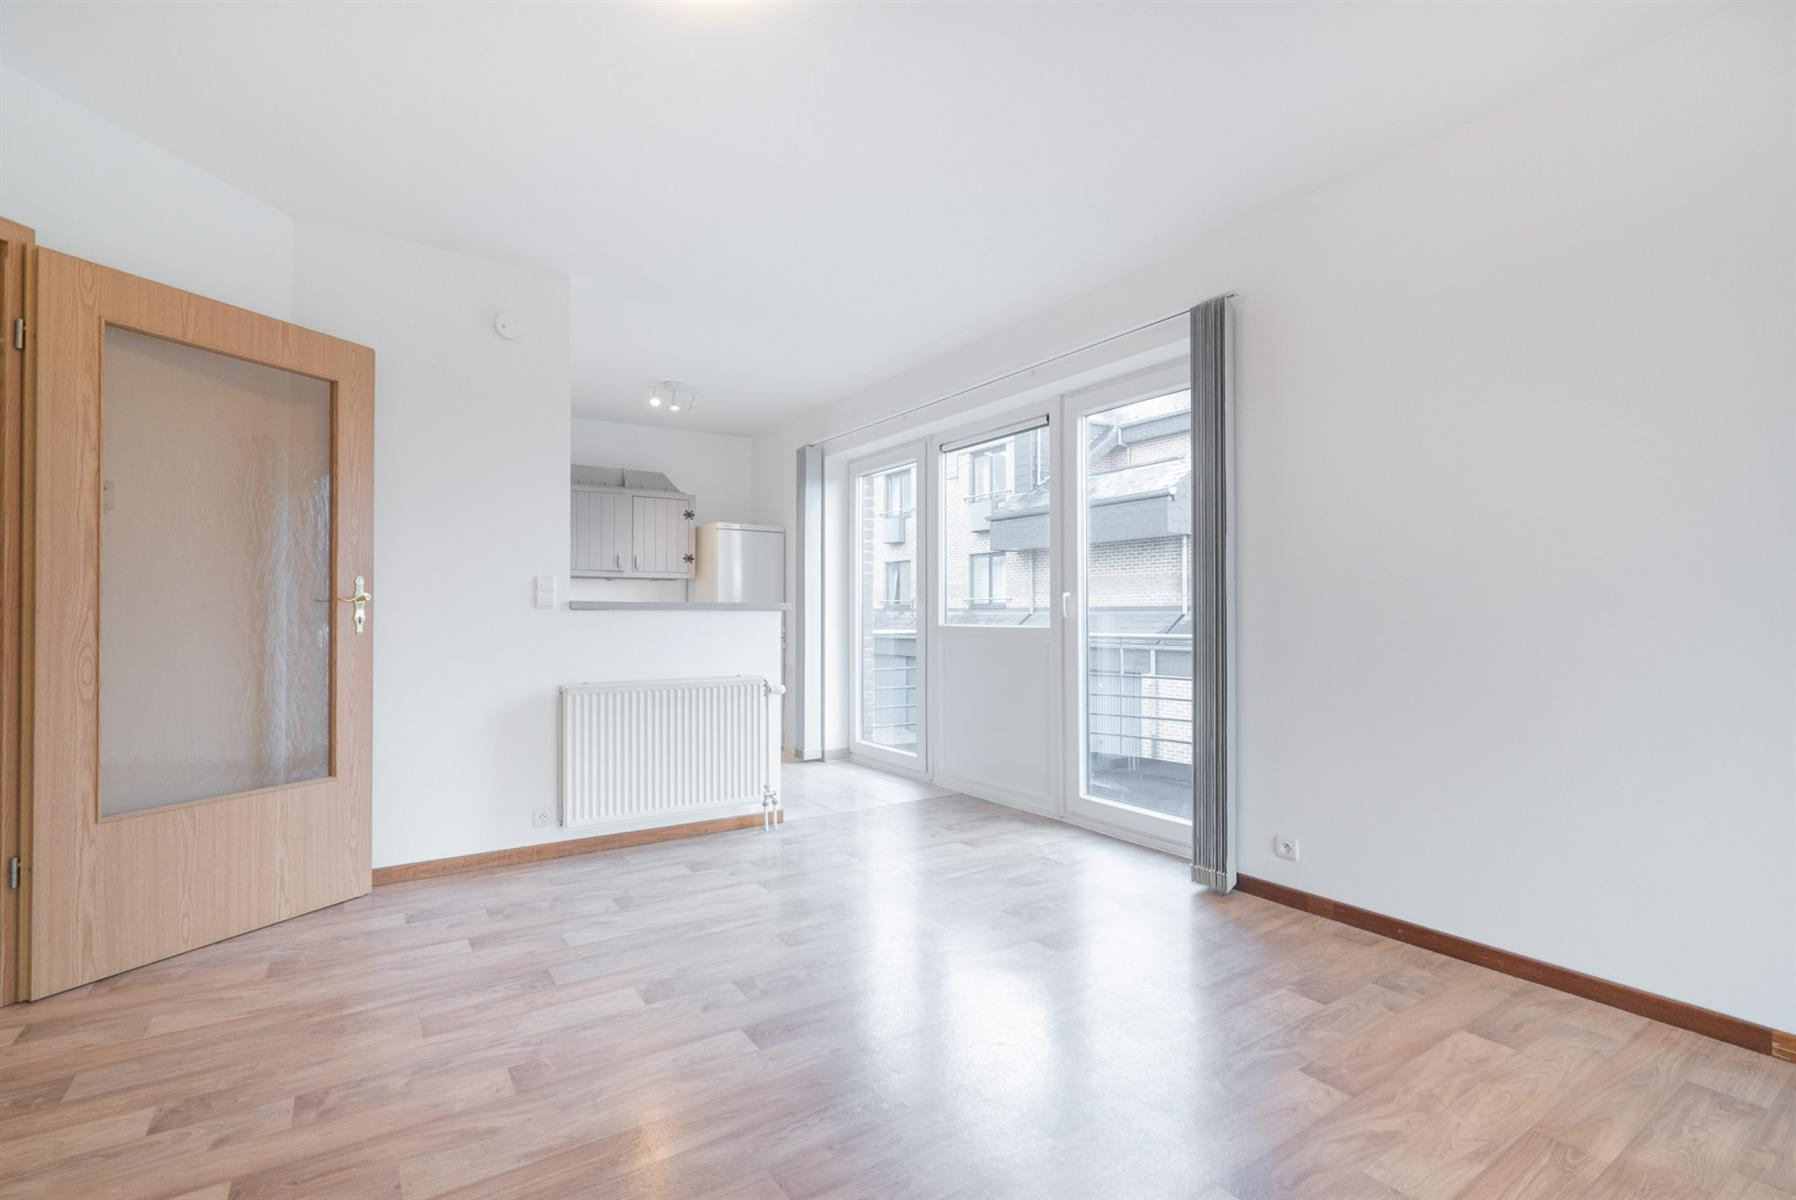 Appartement - Jalhay - #4305578-1